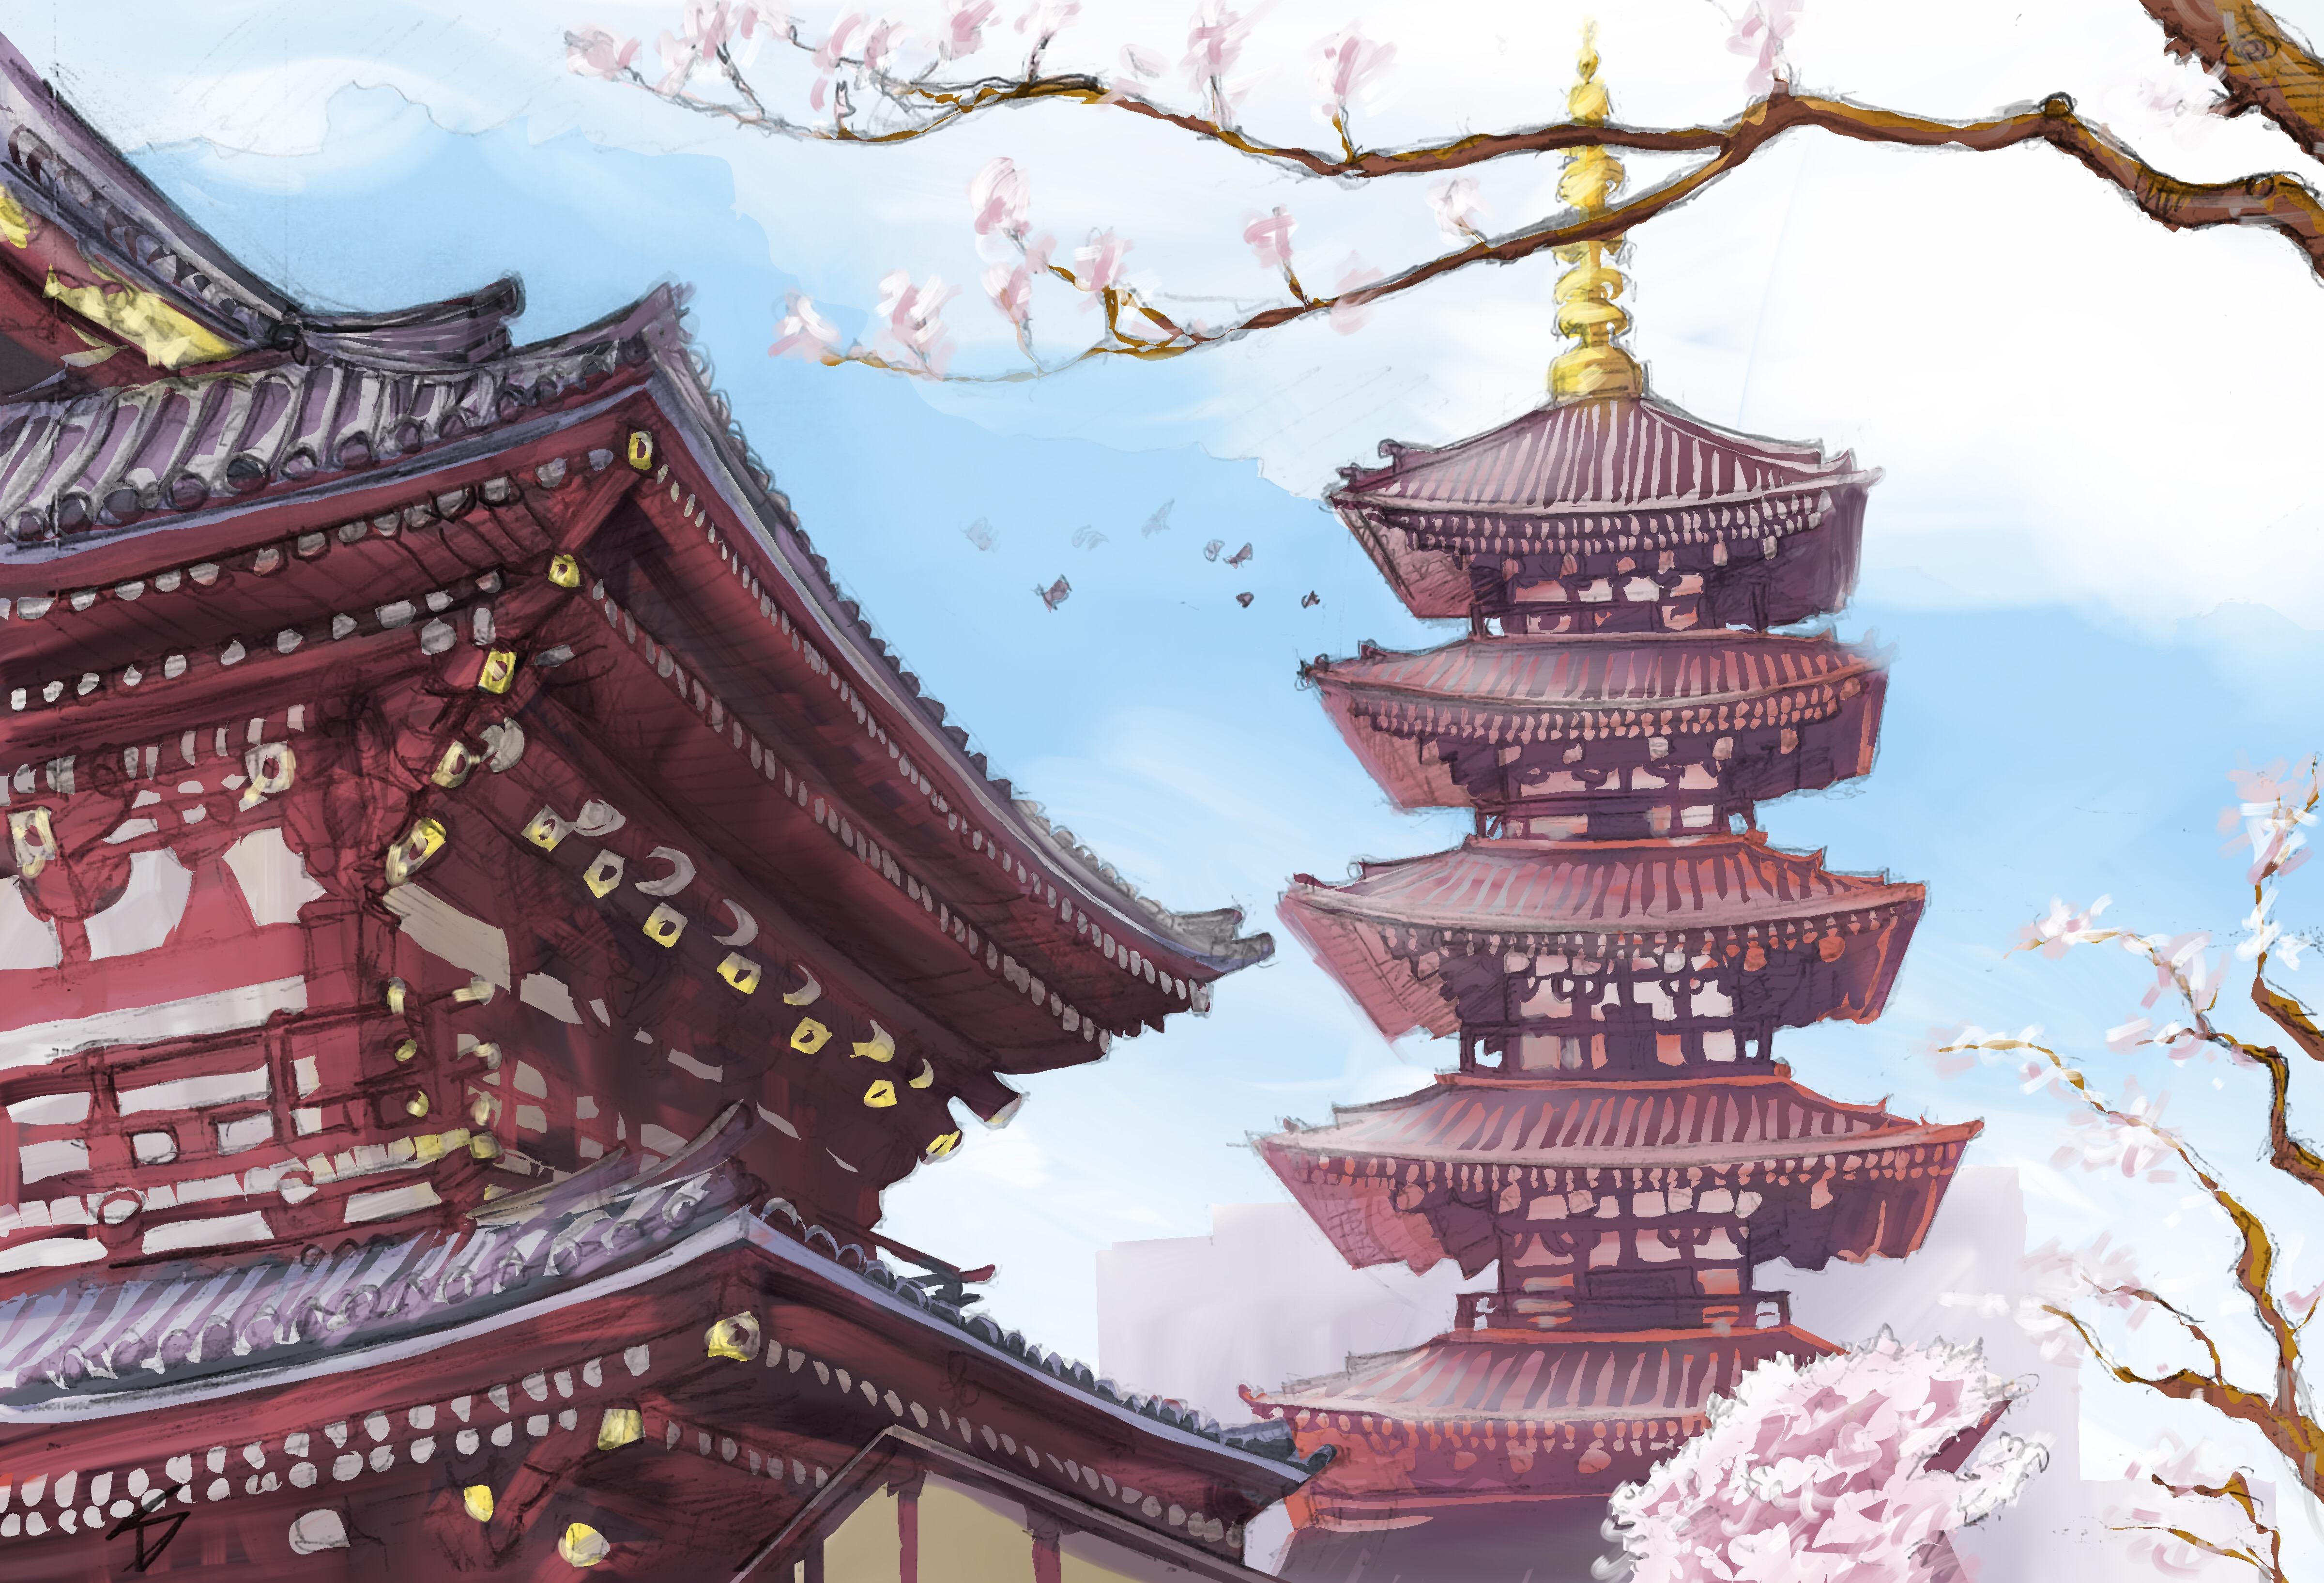 Ipad art - Asakusa, Tokyo, Japan. 'Senso-ji Temple.' A digitally painted up version of my original sketch. sketchbookexplorer.com @davidasutton @sketchbookexplorer Facebook.com/davidanthonysutton #japan #tokyo #asakusa #Sensojitemple #travel #travelblog #art #sketching #cheeryblossom #cherryblossomseason #cherryblossomjapan #ipadart #procreate #sketchbookpro